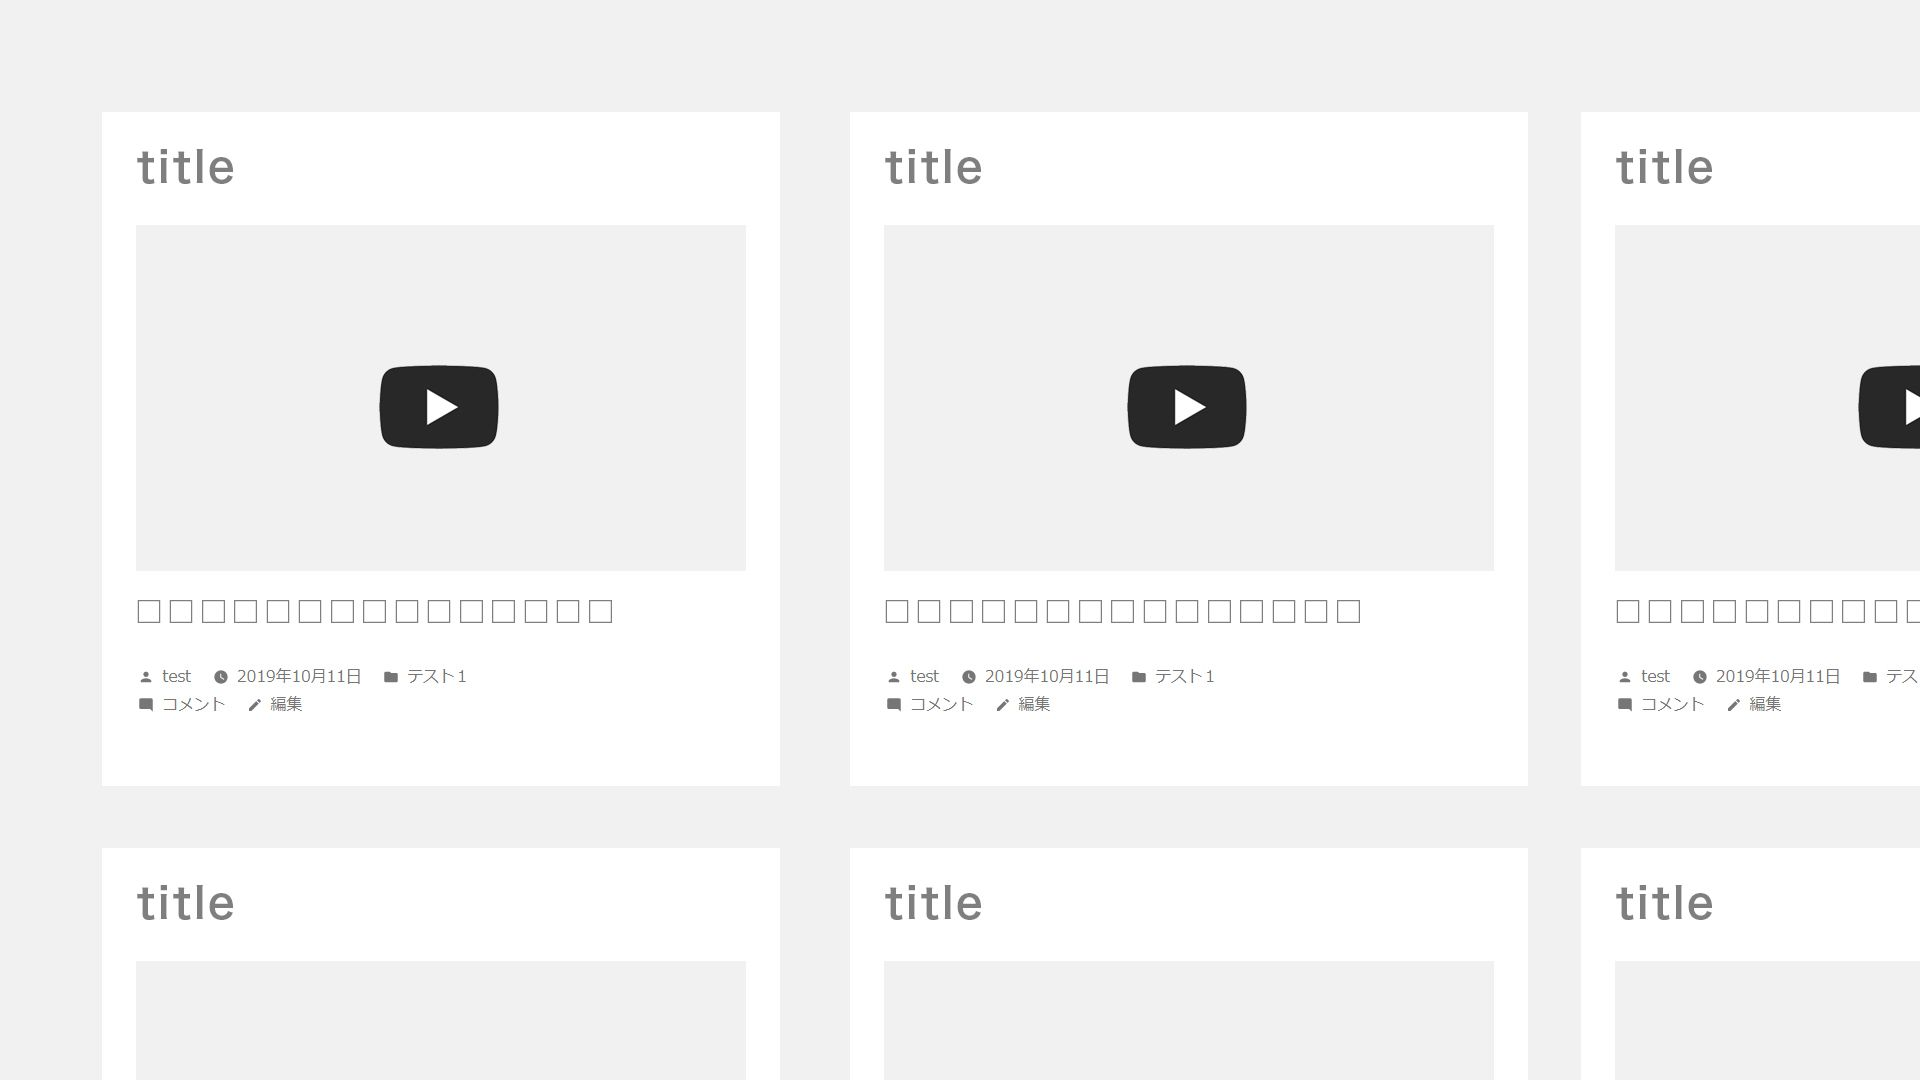 WordPressの記事アイキャッチをYoutube動画にするプラグイン